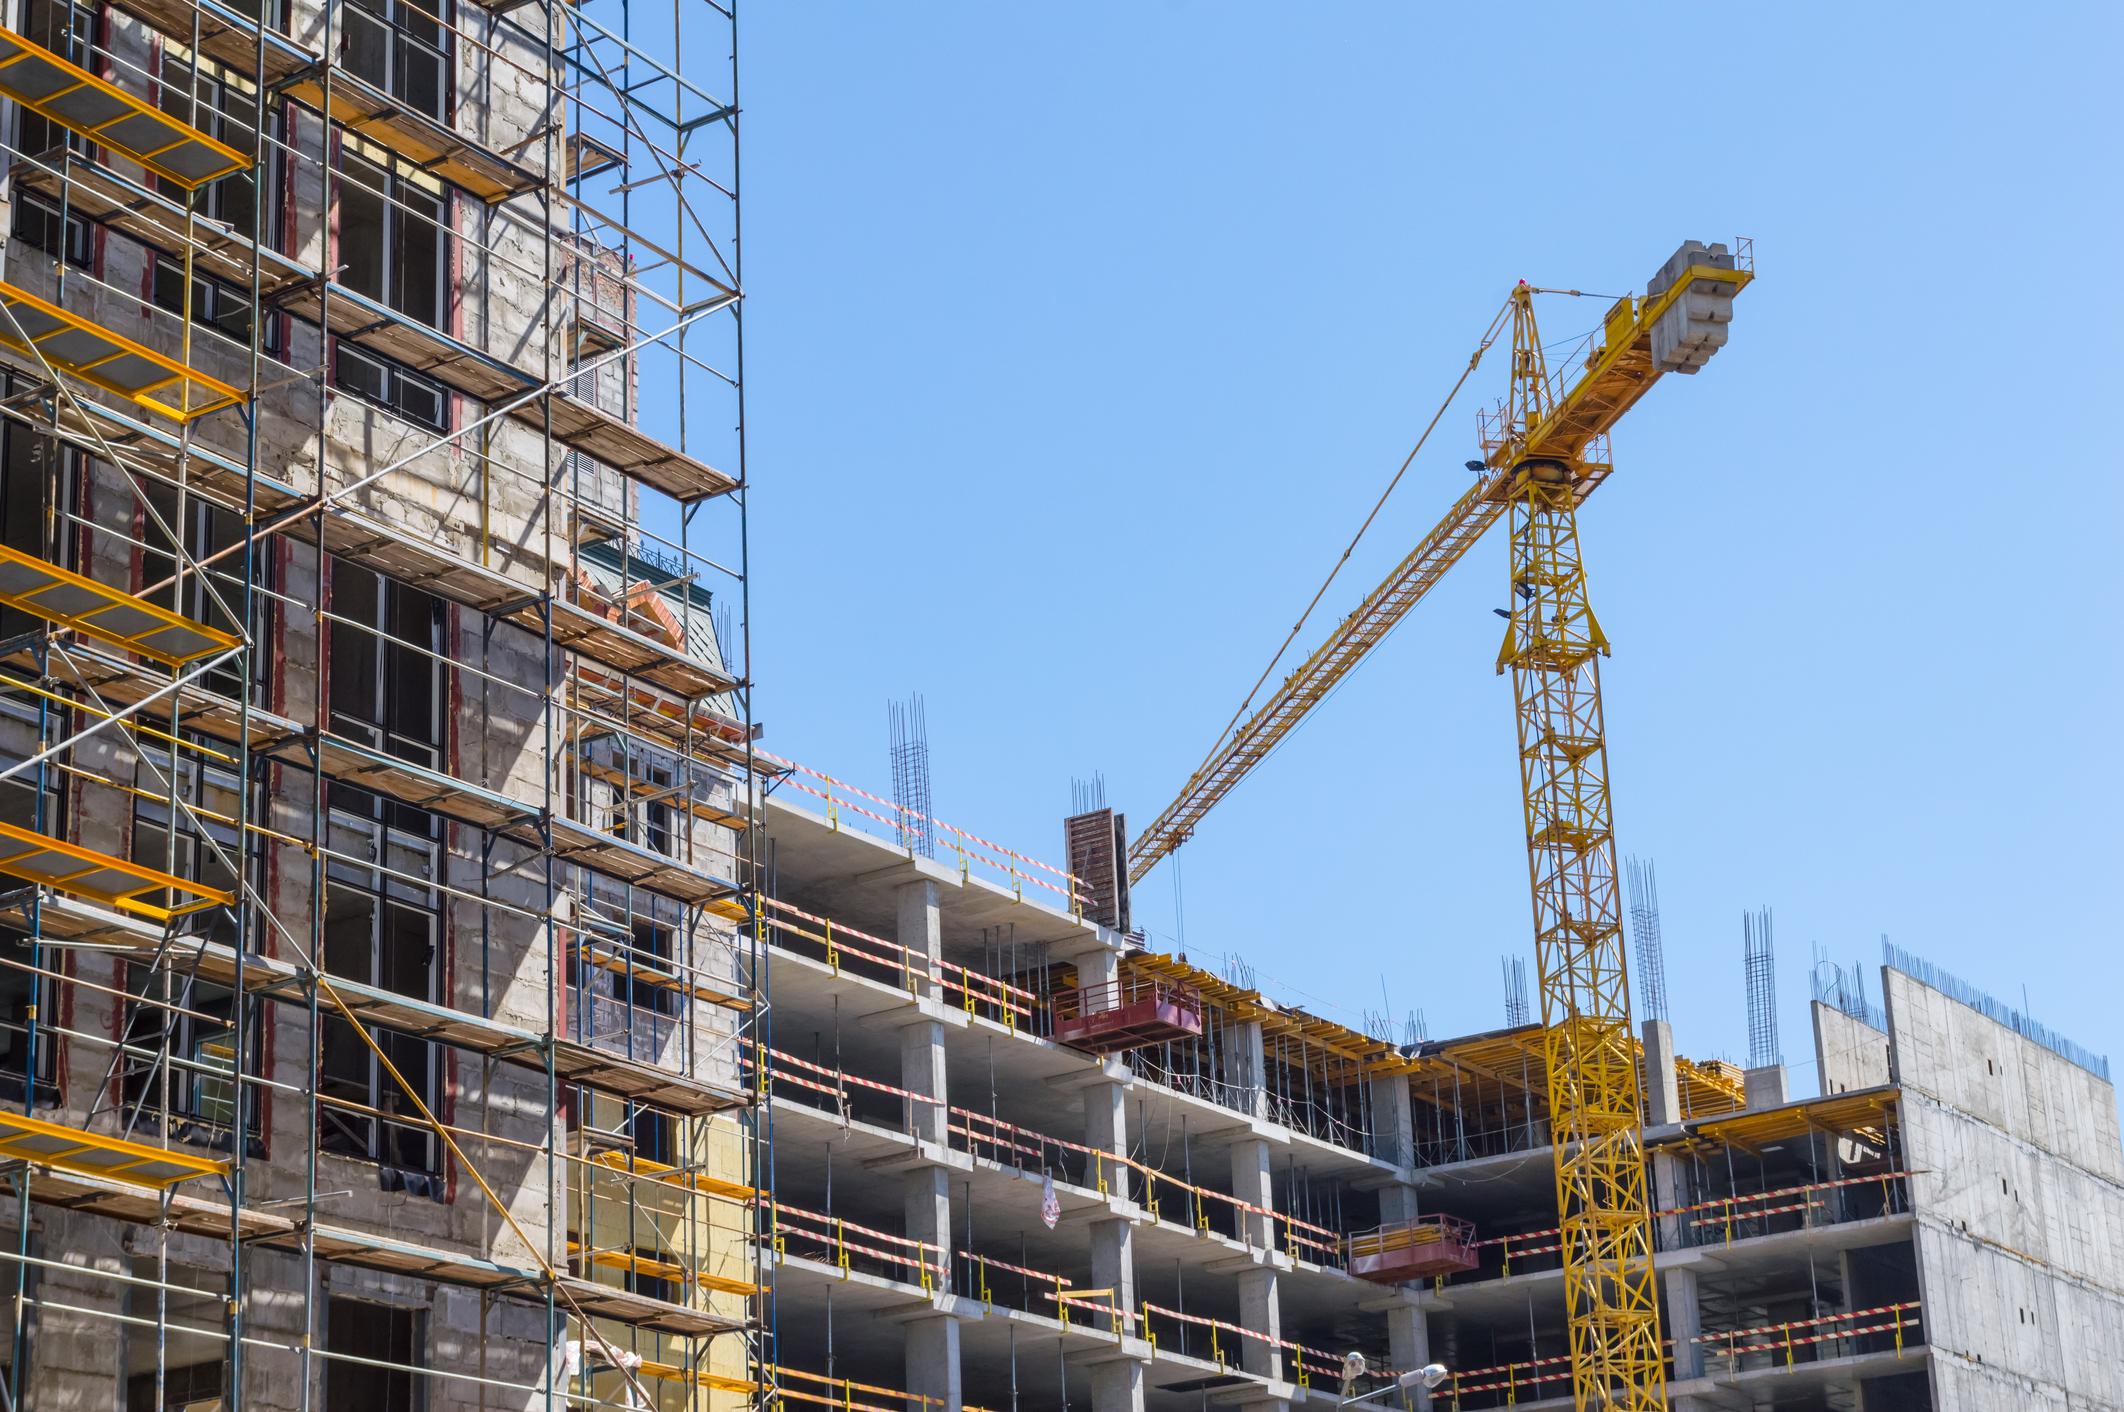 A construction crane building an apartment complex.